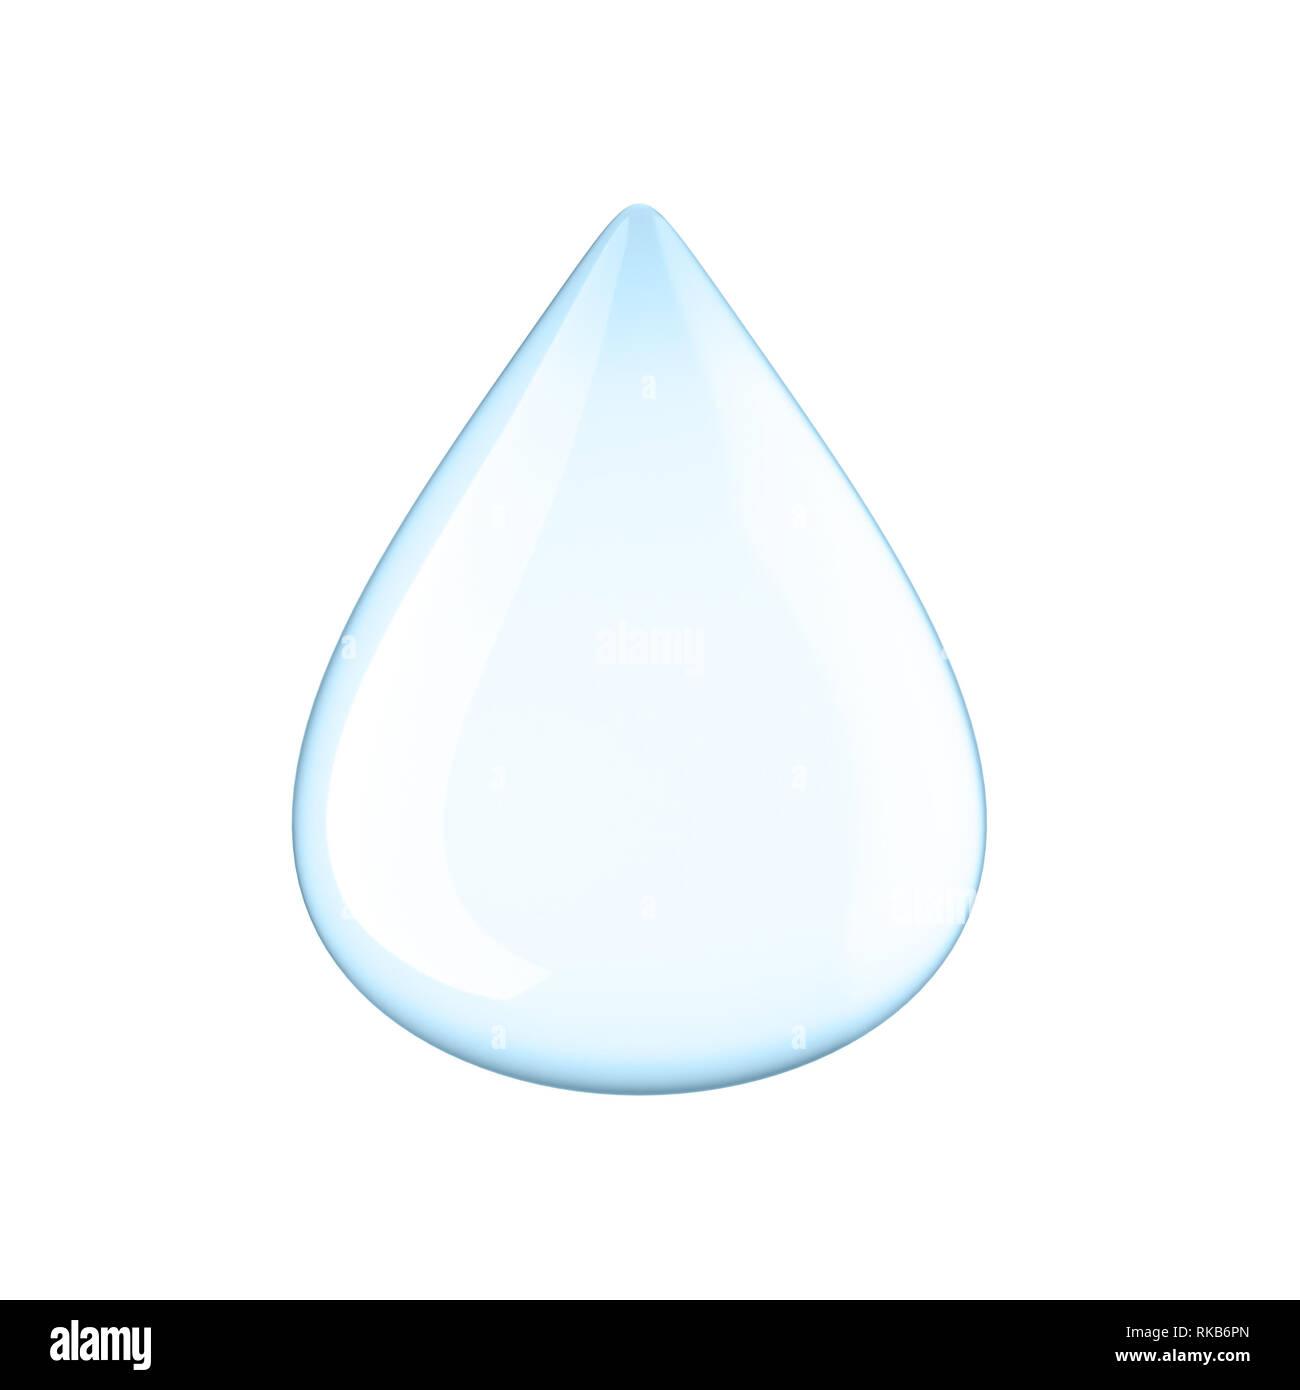 Water drop - Stock Image